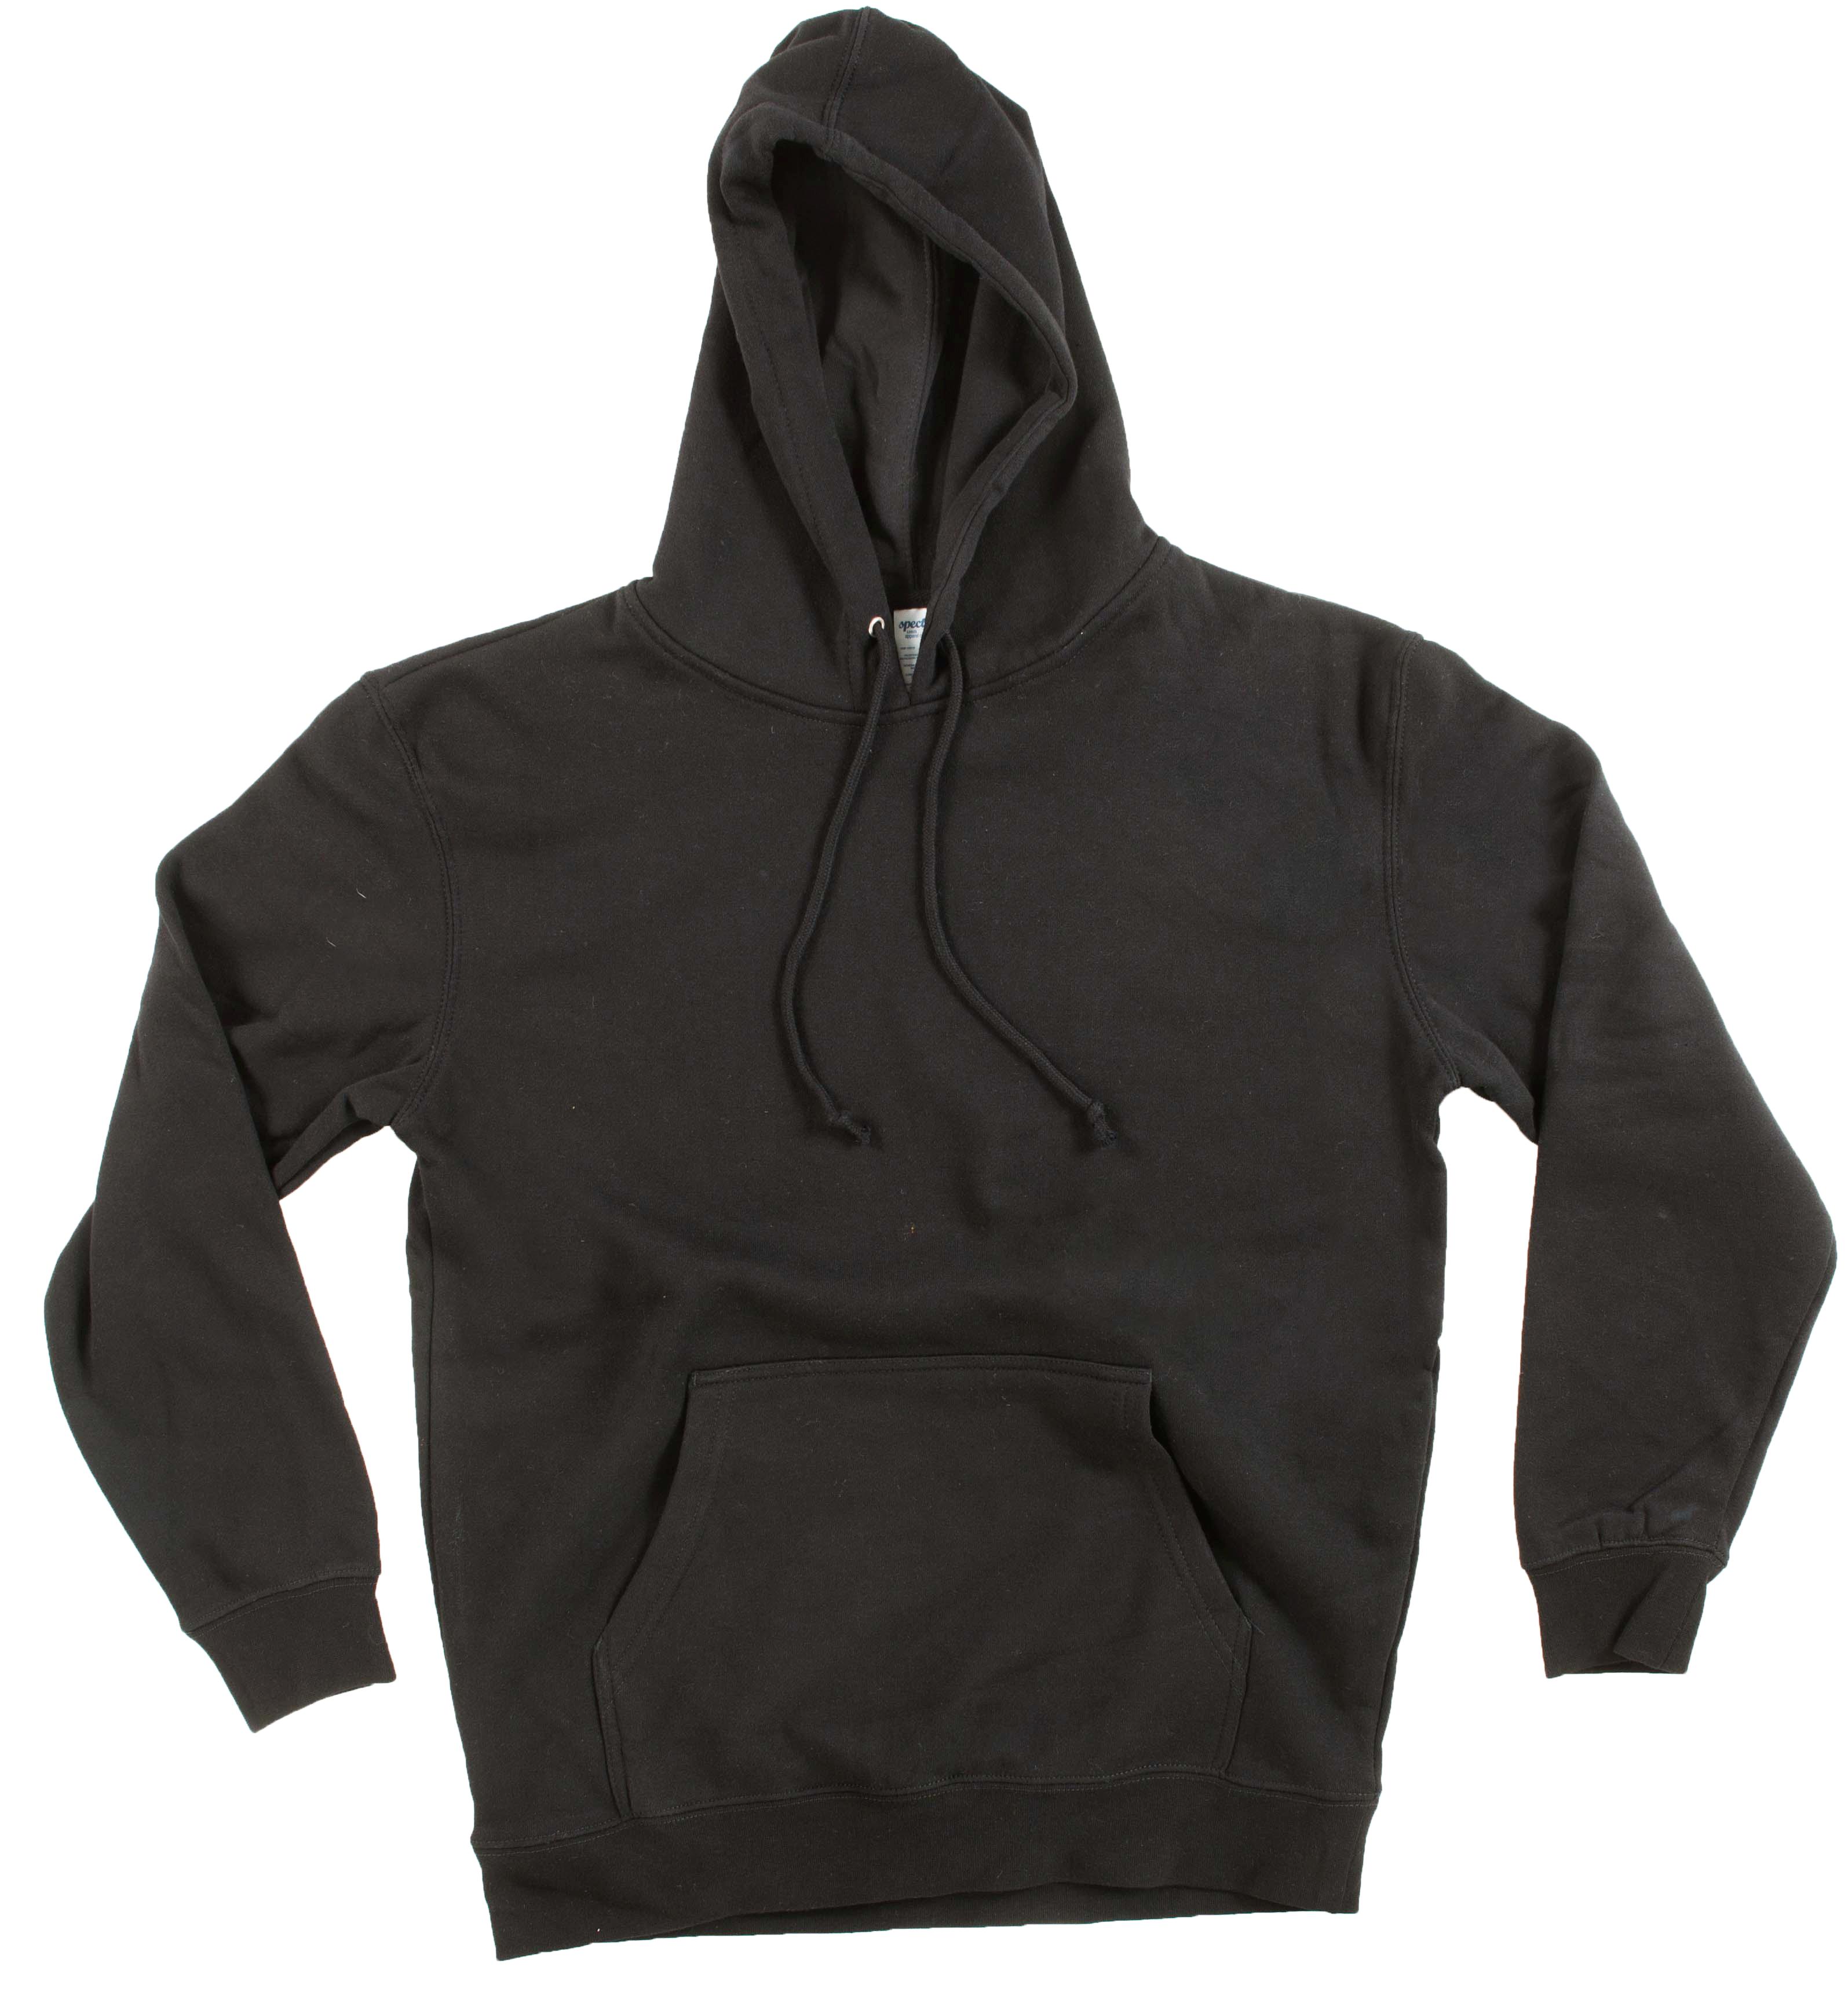 295de949a49 Screen Printing On Hooded Sweatshirts - BCD Tofu House